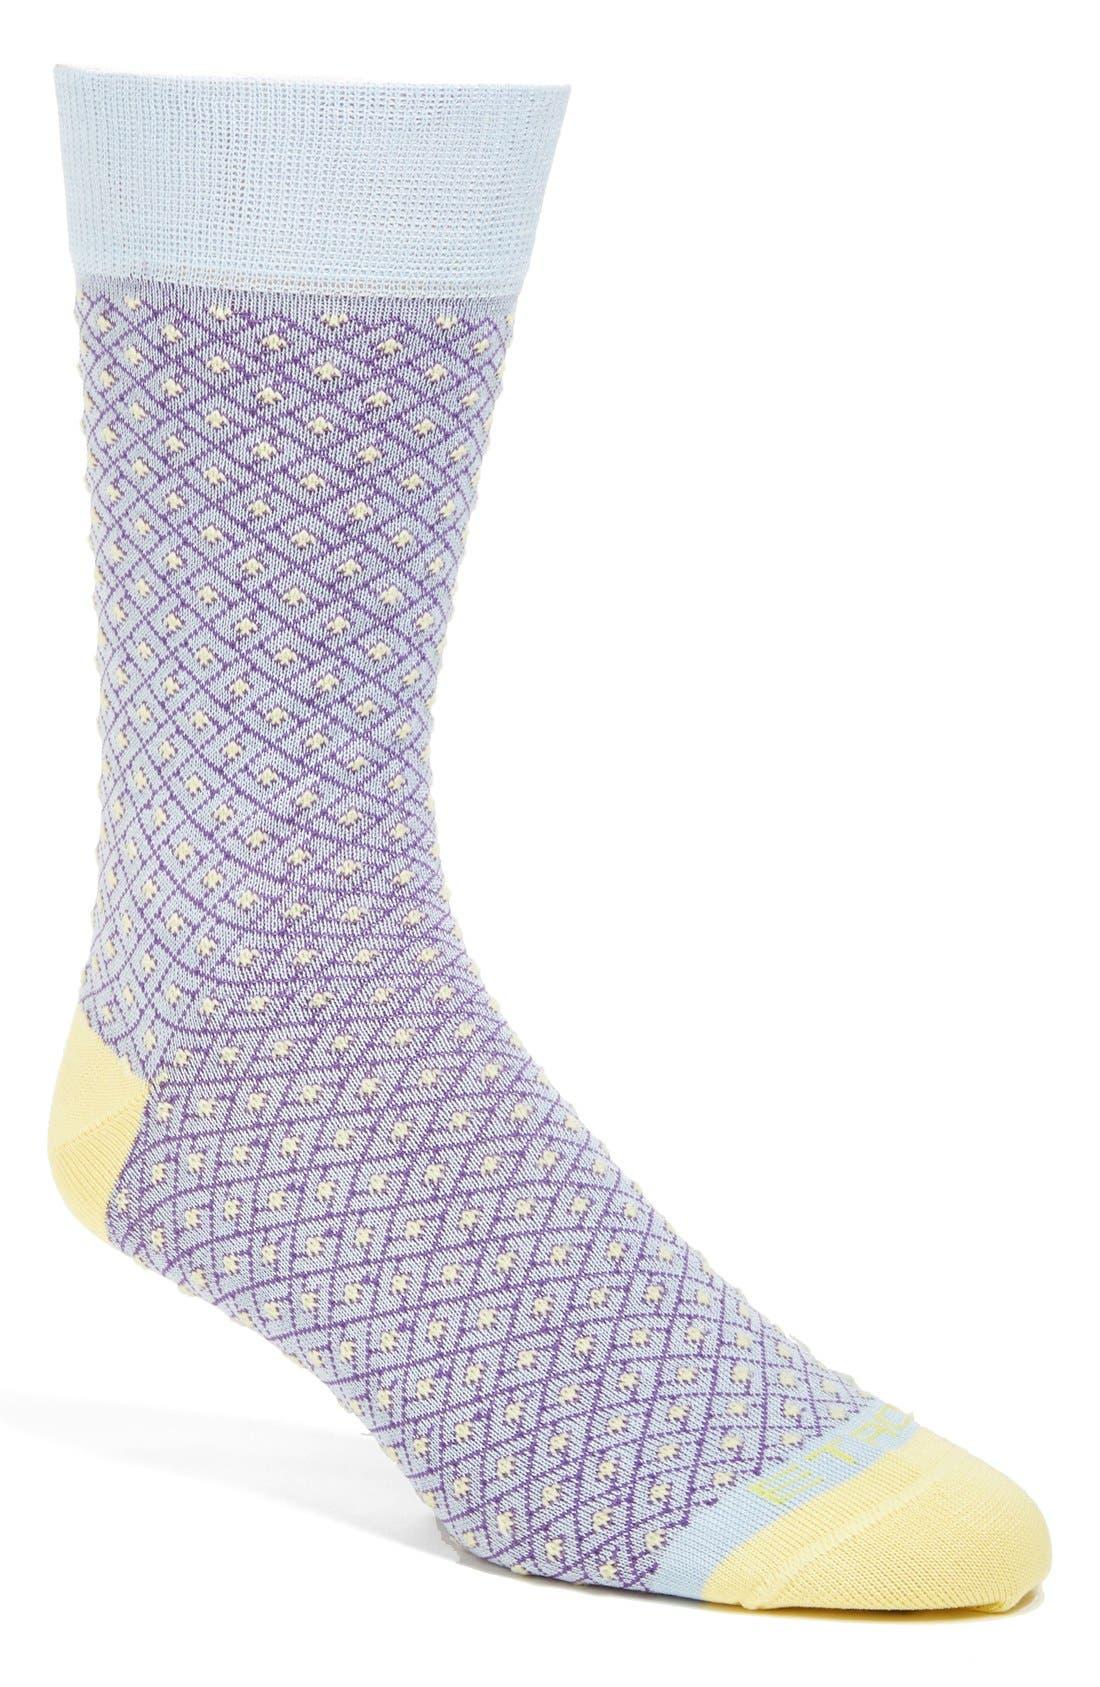 Alternate Image 1 Selected - Etro Grid Socks